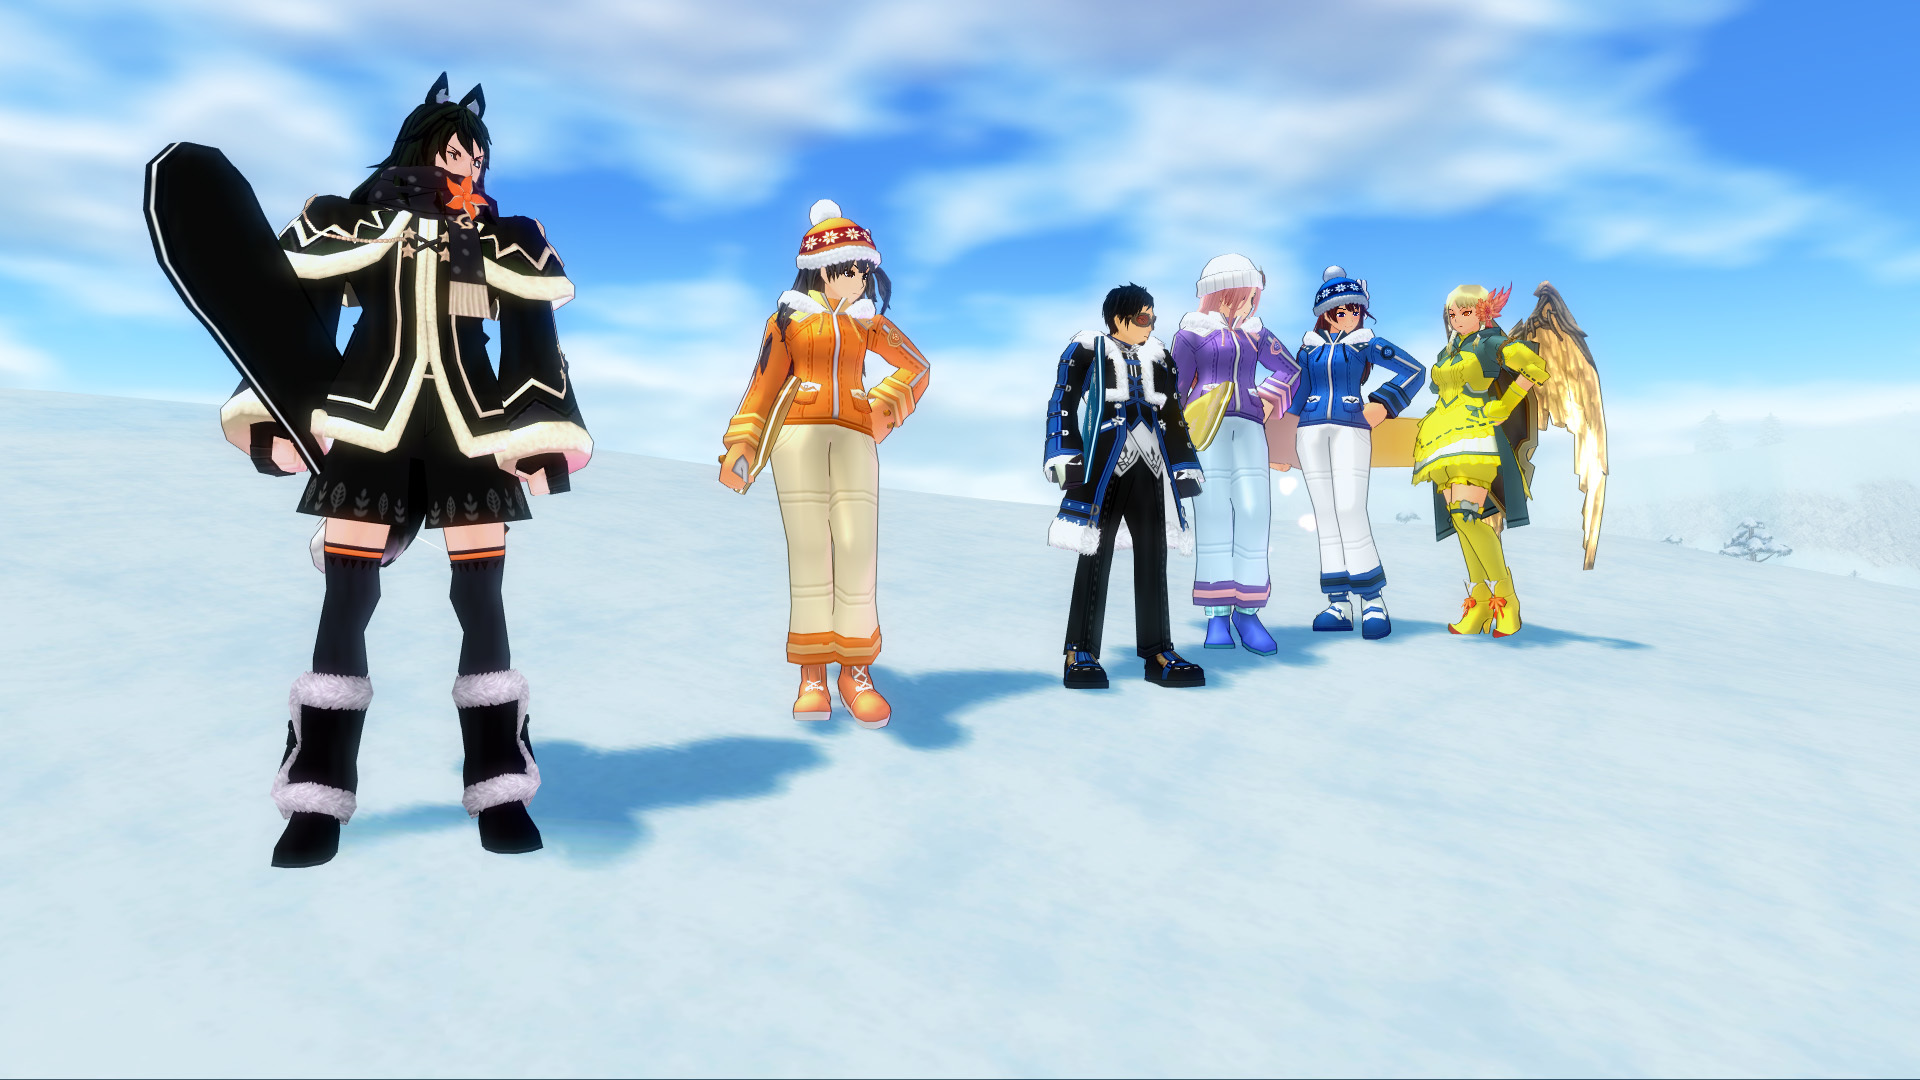 雪遊び撮影会03